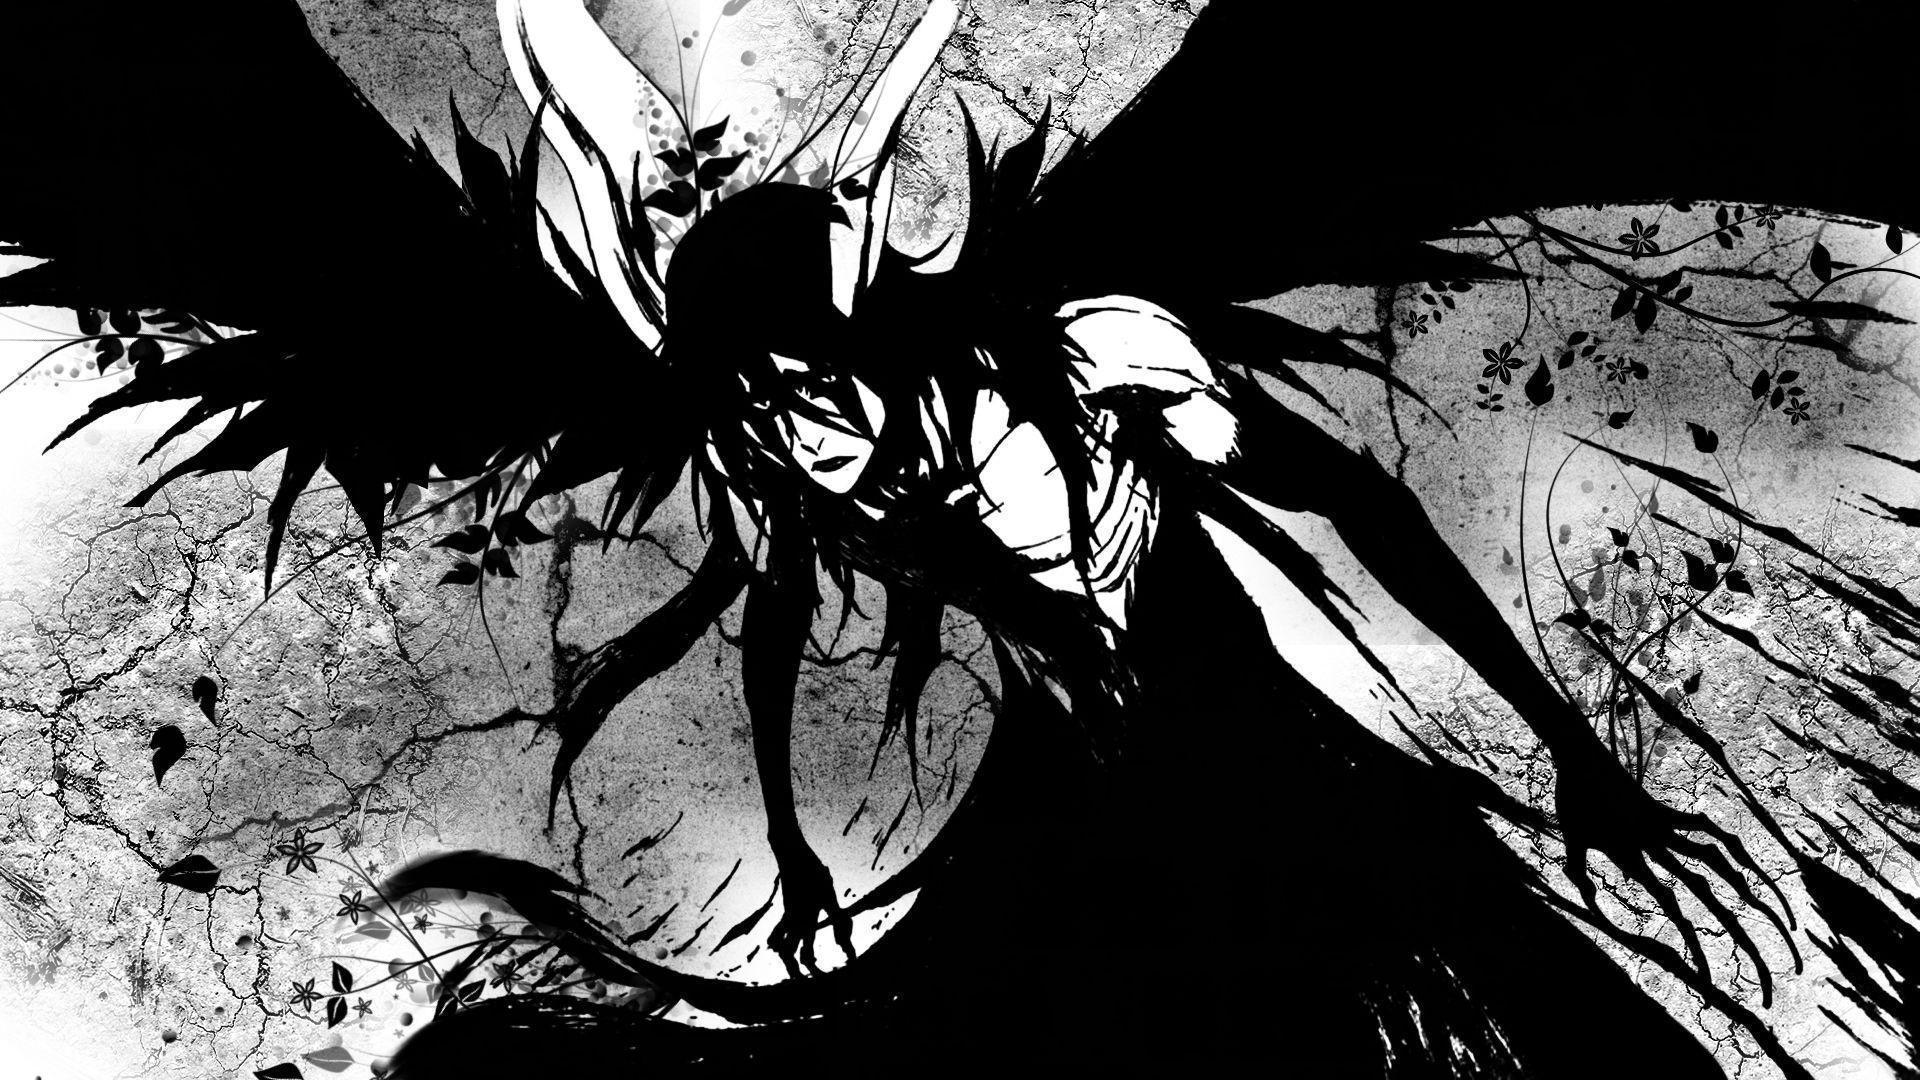 Bleach Espada Wallpapers - Wallpaper Cave  |Bleach Wallpaper Espada 2